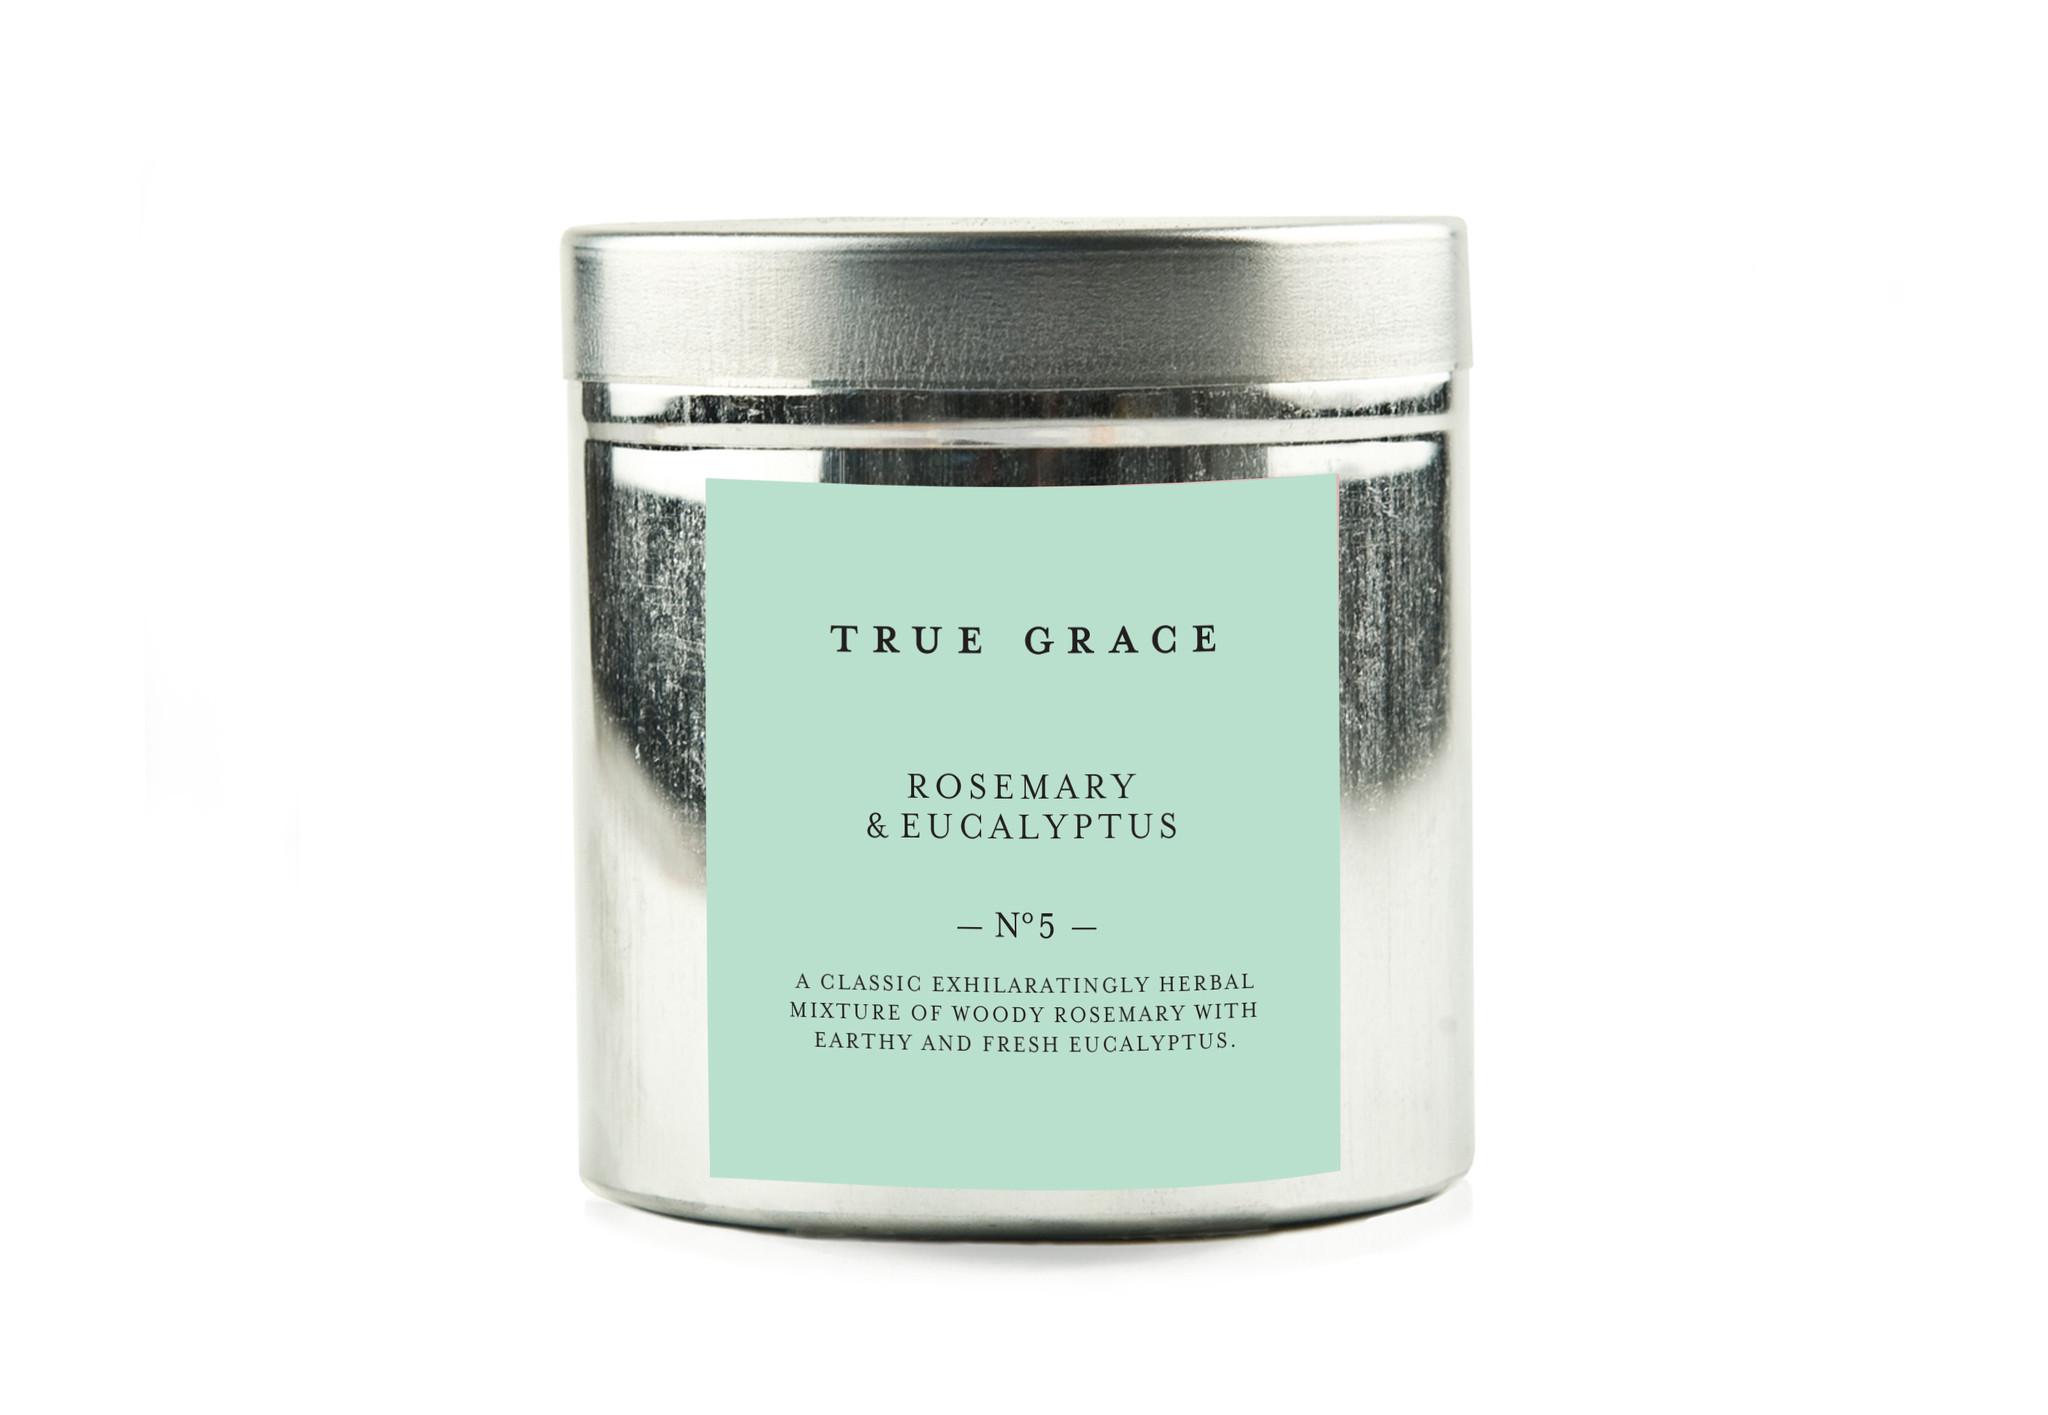 True Grace Walled Garden Candle in Tin - Rosemary & Eucalyptus